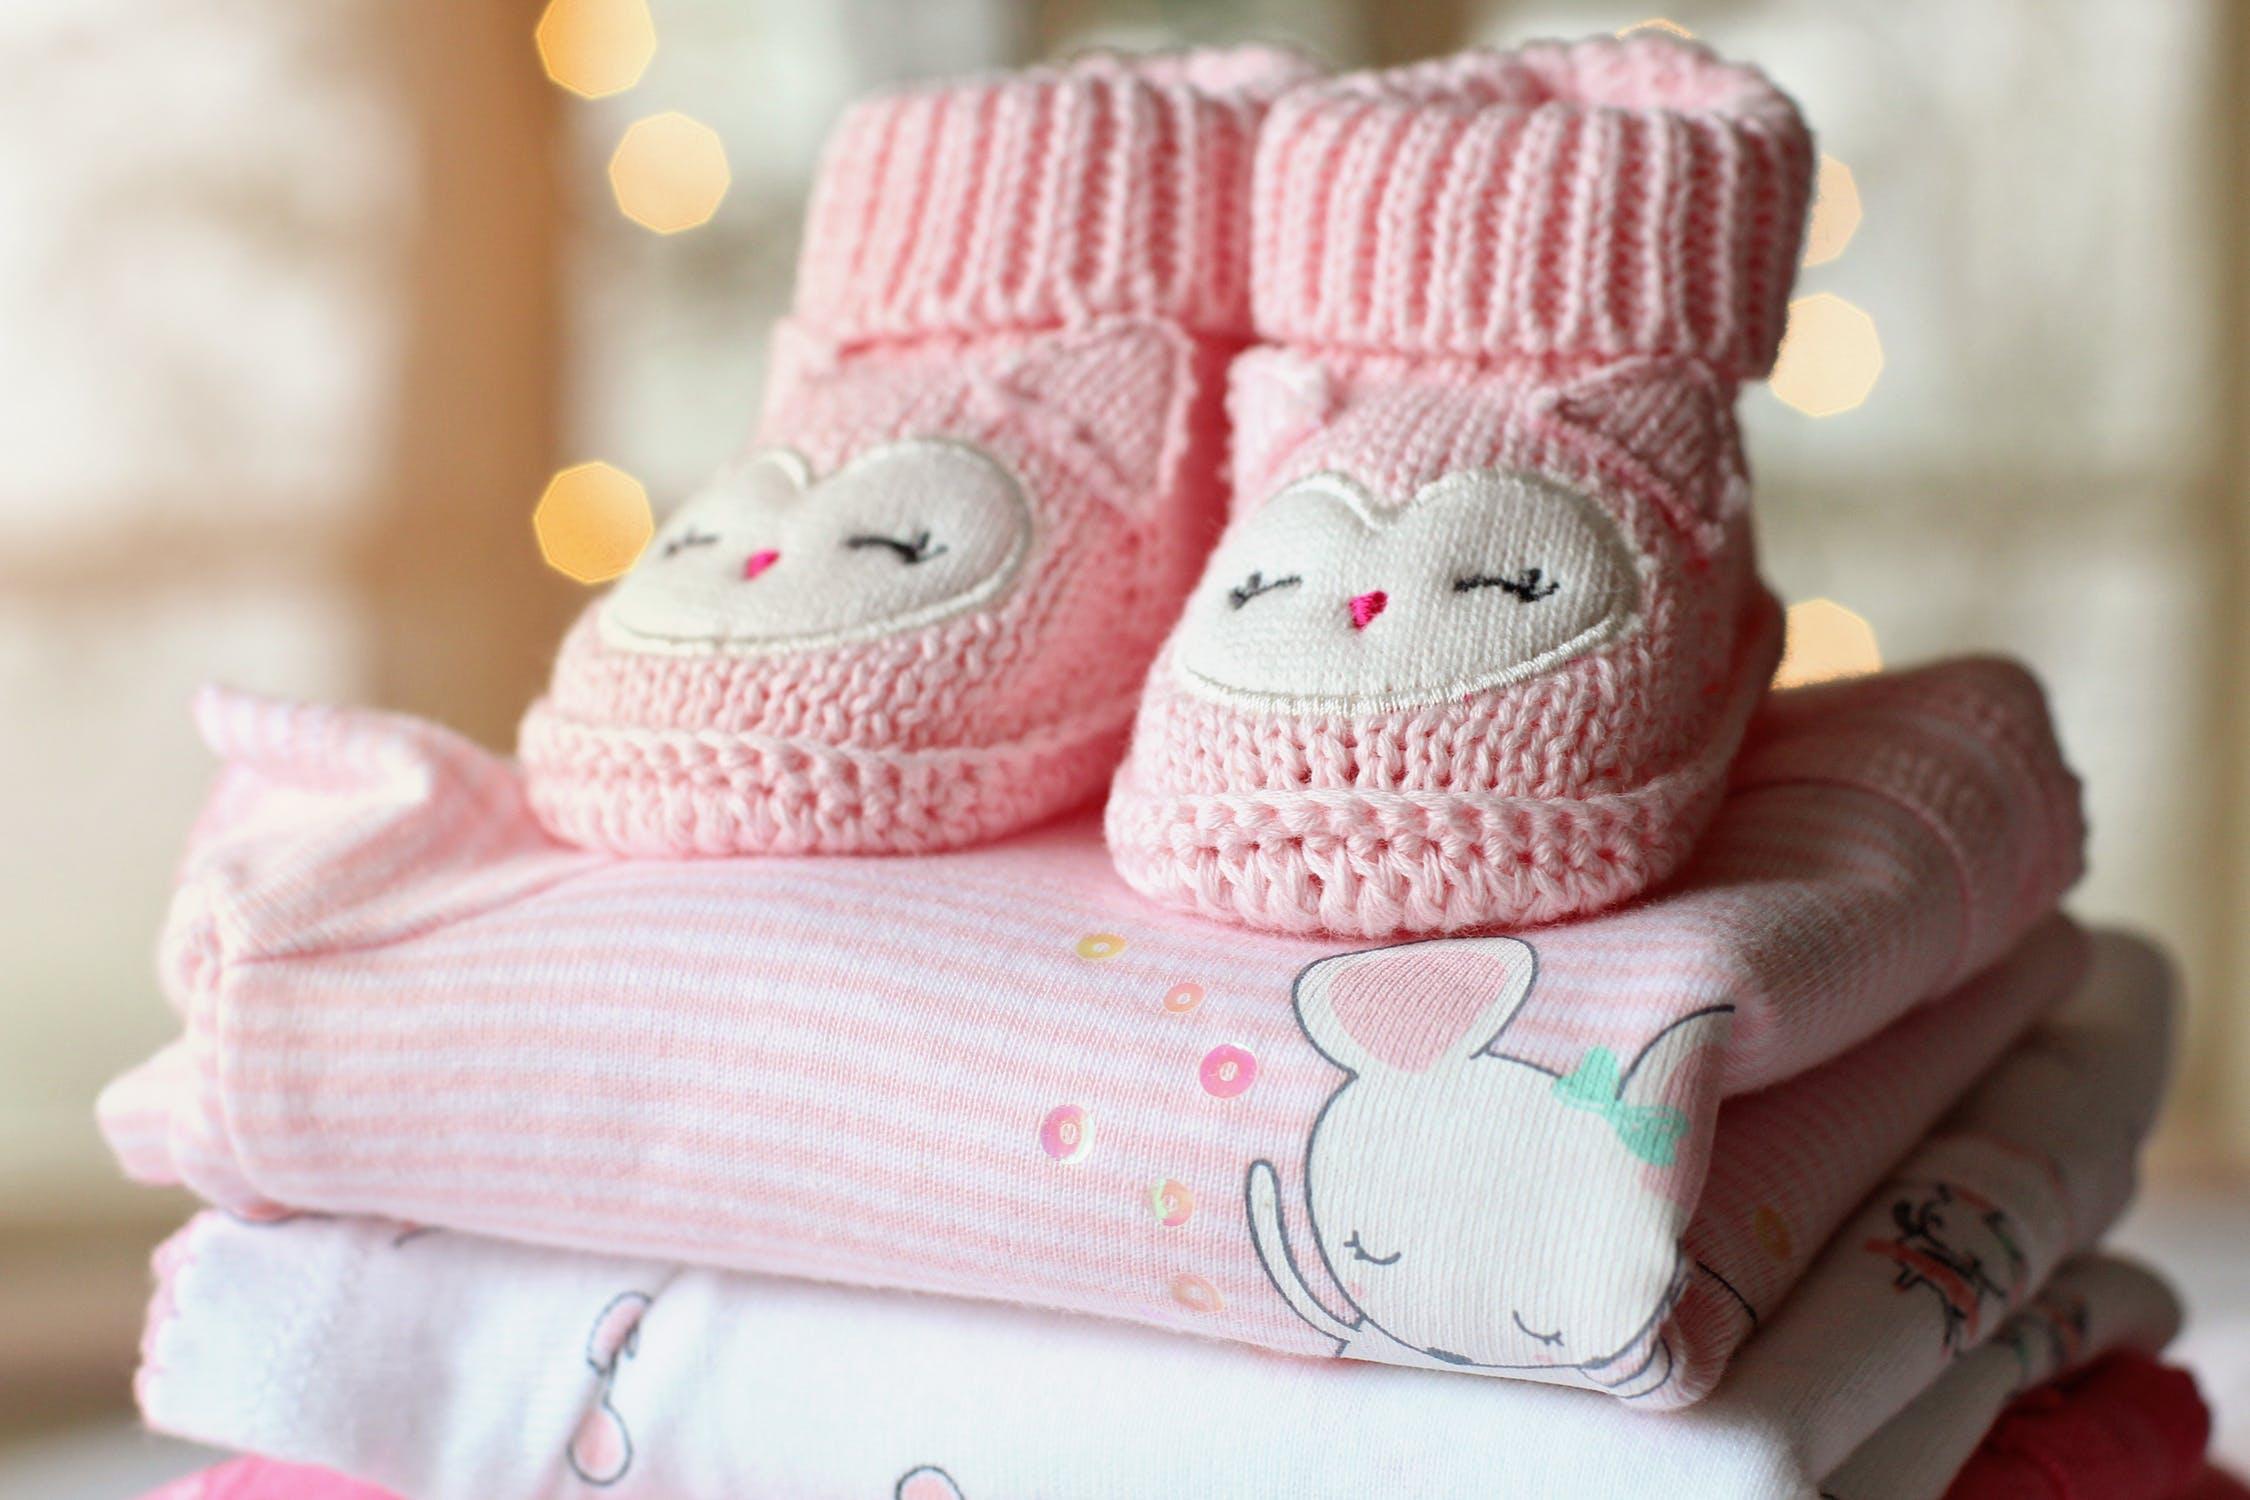 Babykleding Kopen.Babykleding Online Kopen Alle Babymaten Op Een Rijtje En Handige Tips